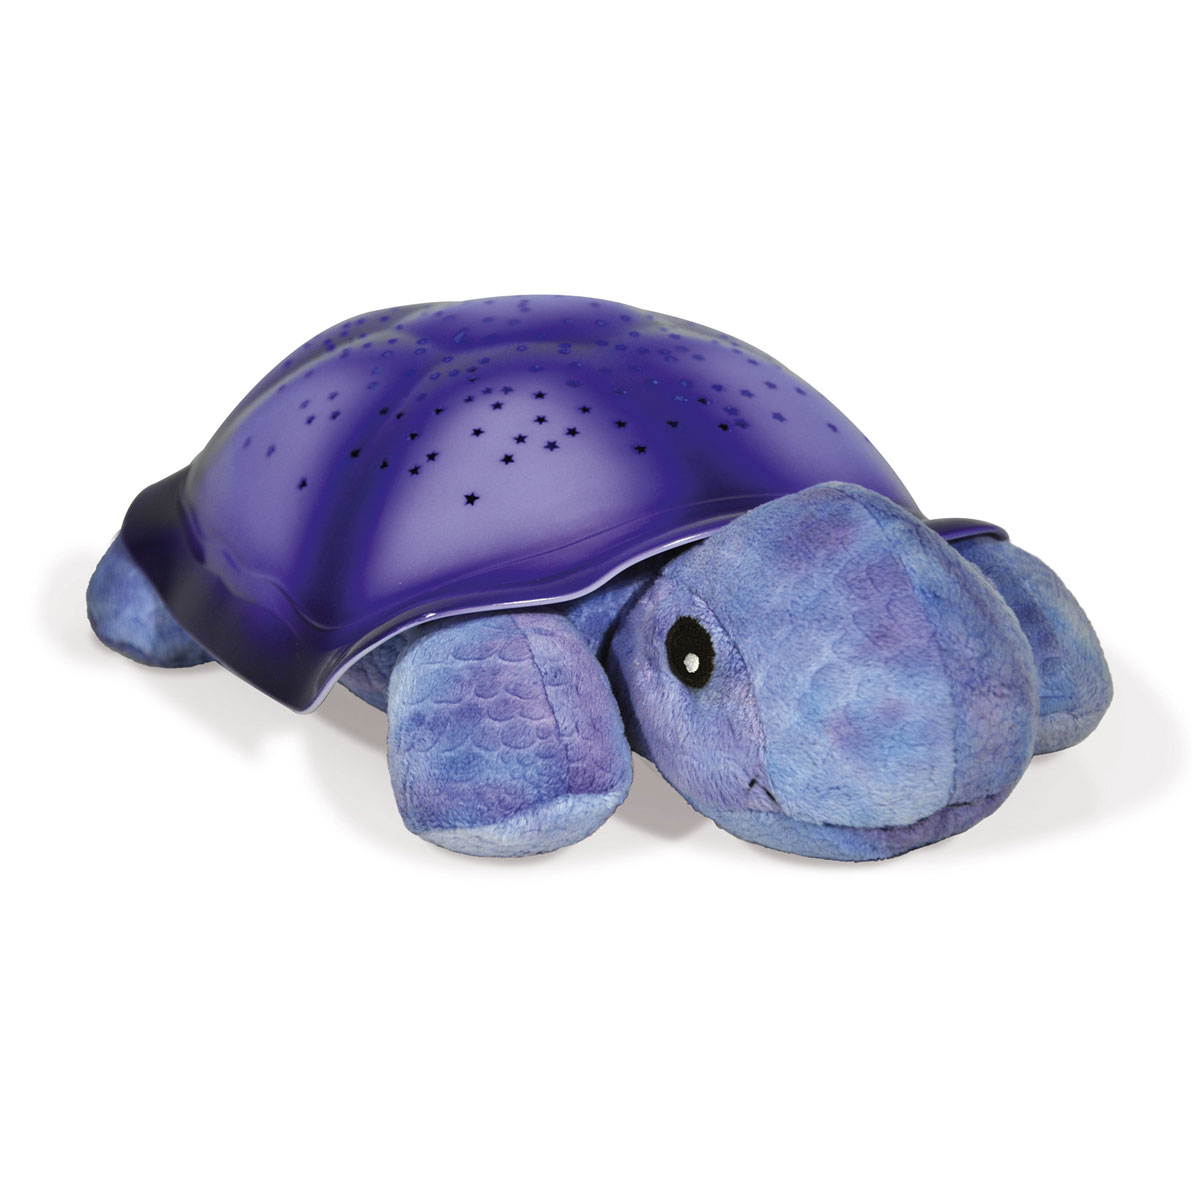 Veilleuse Veilleuse Twilight Turtle - Purple Veilleuse Twilight Turtle - Purple